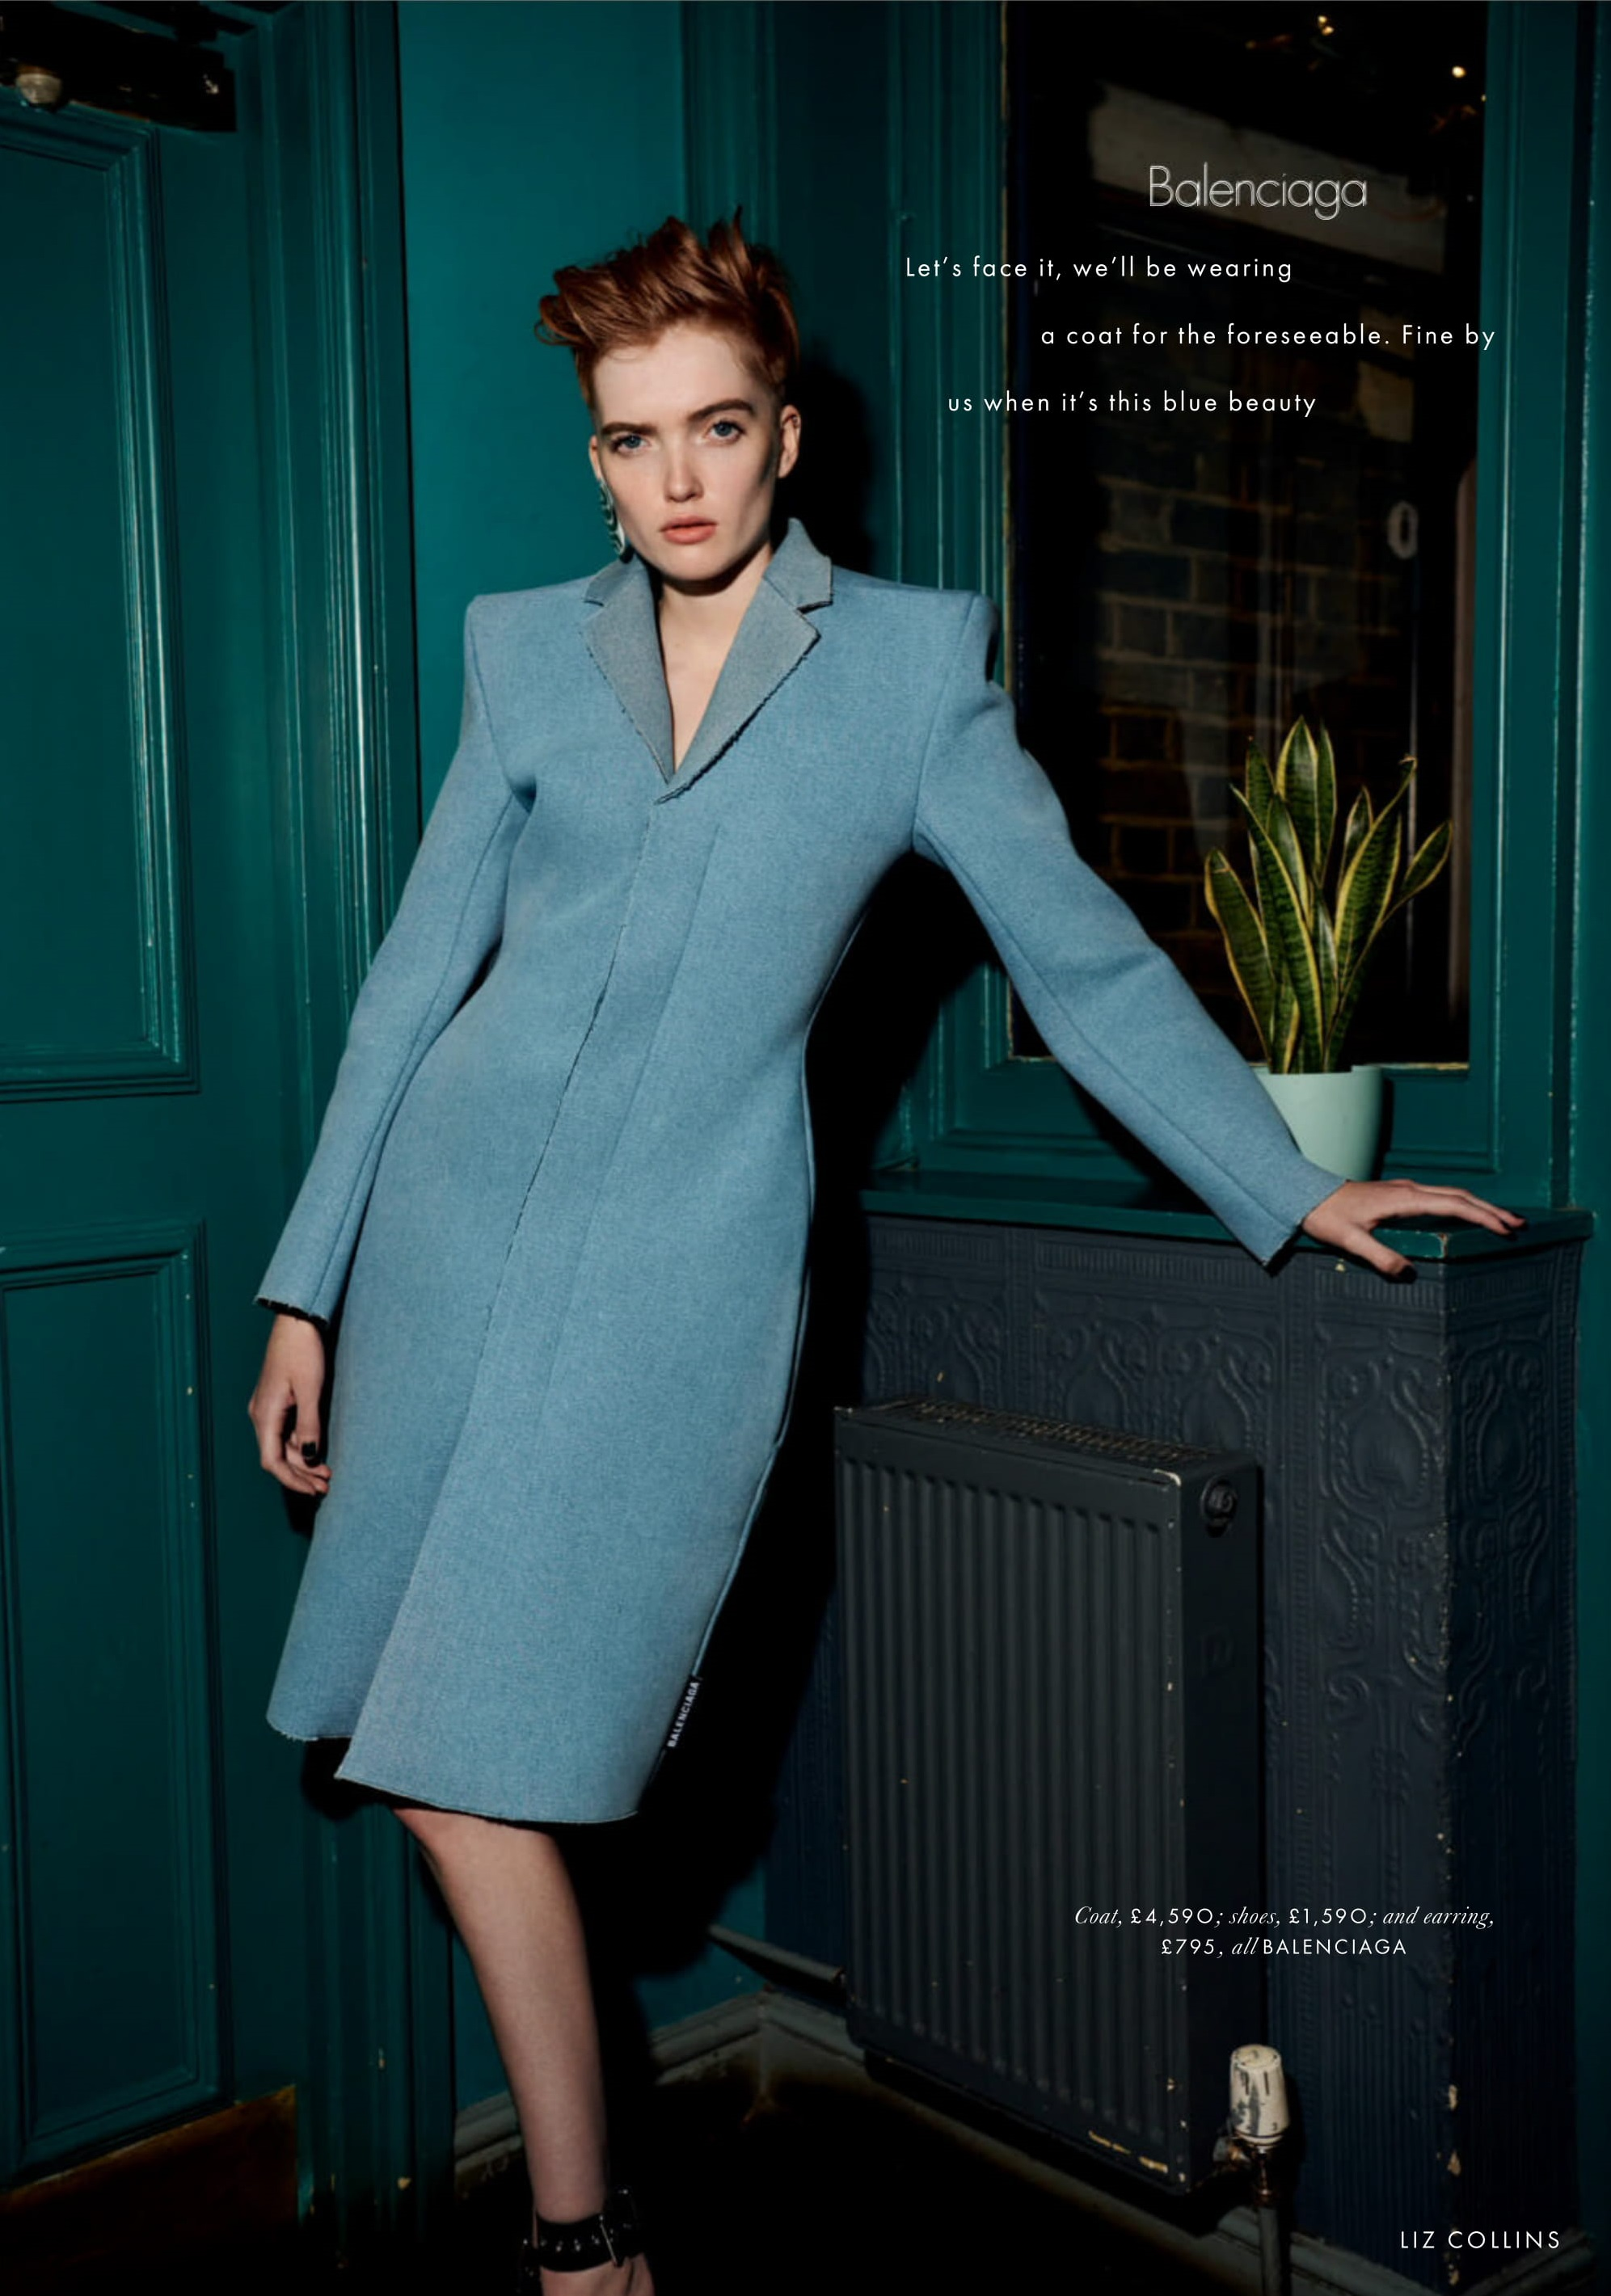 Ruth Bell Vogue UK Feb 2019 London Look (10).jpg